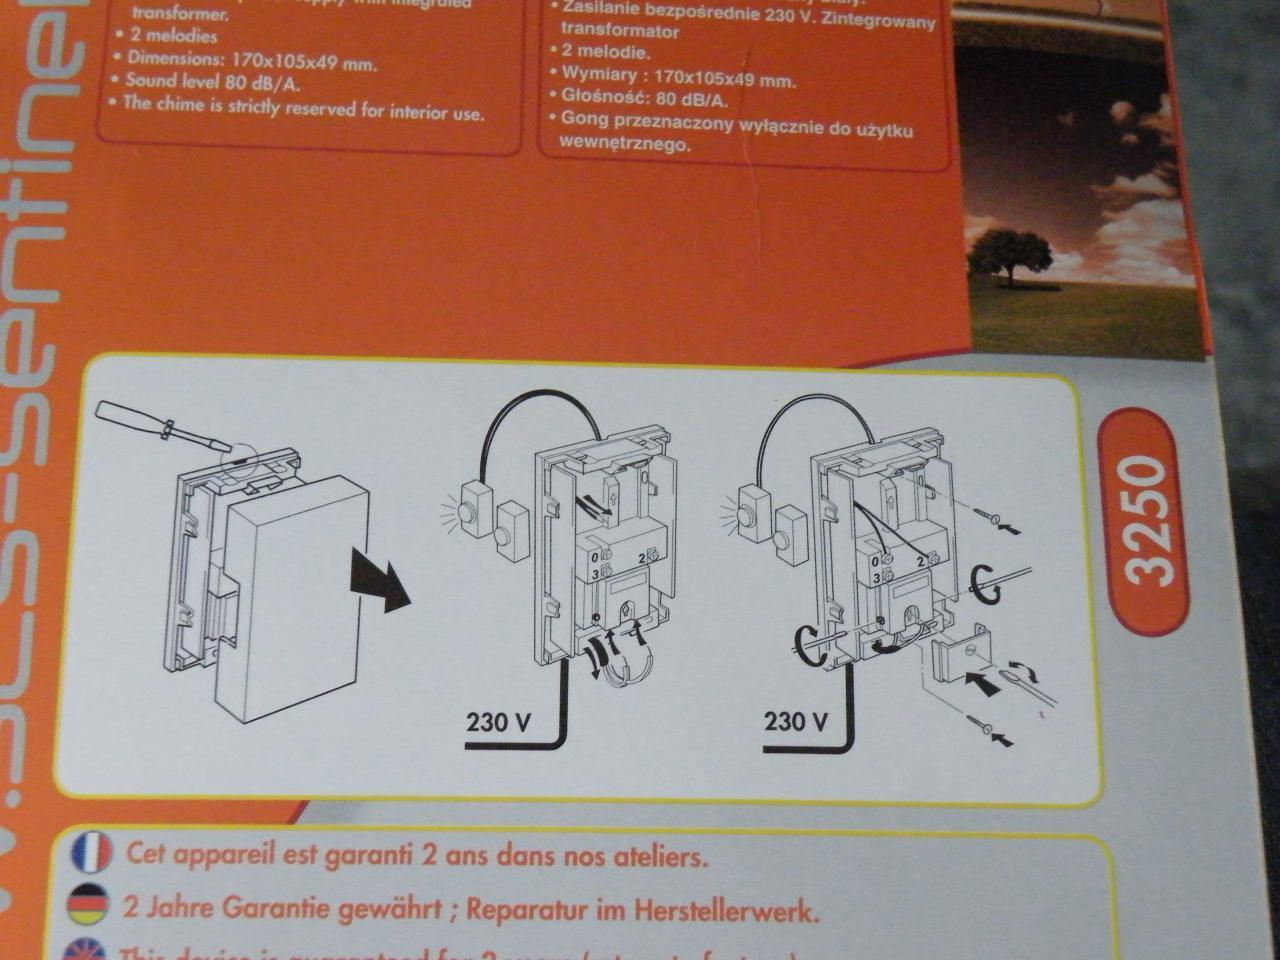 Schema installation sonnette filaire - Comment installer une sonnette filaire ...